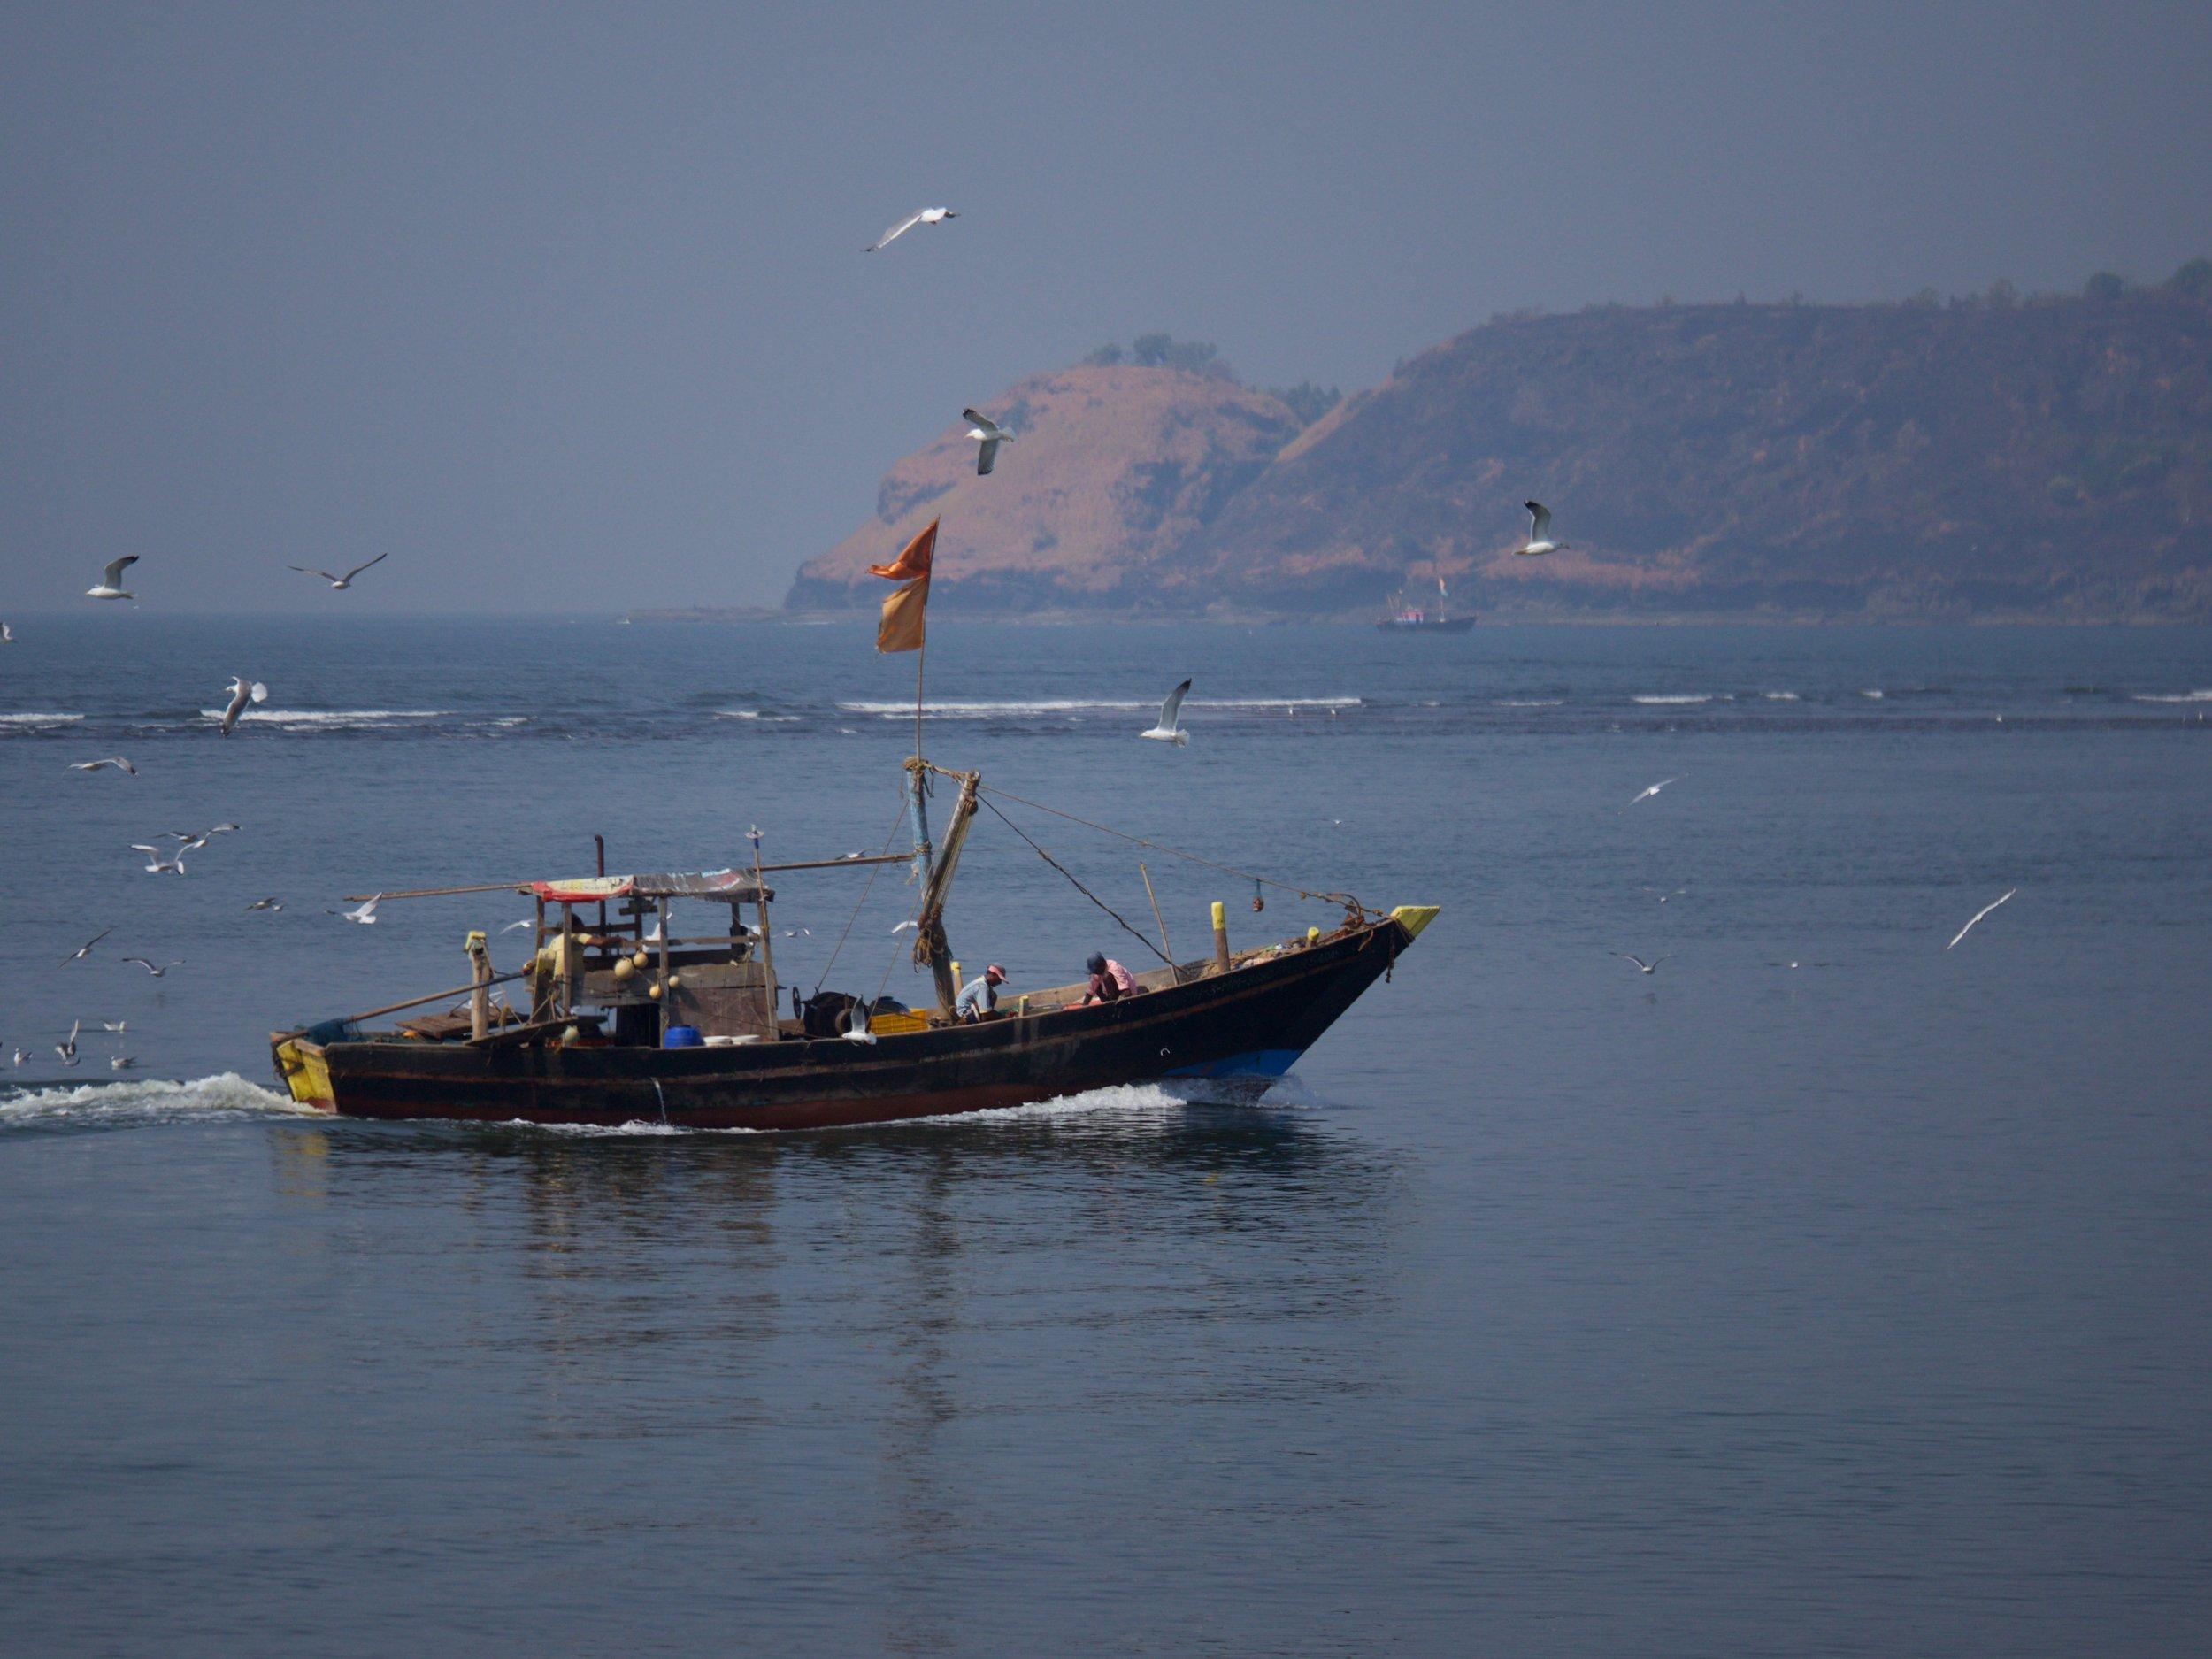 A fishing boat returns to port near Velas